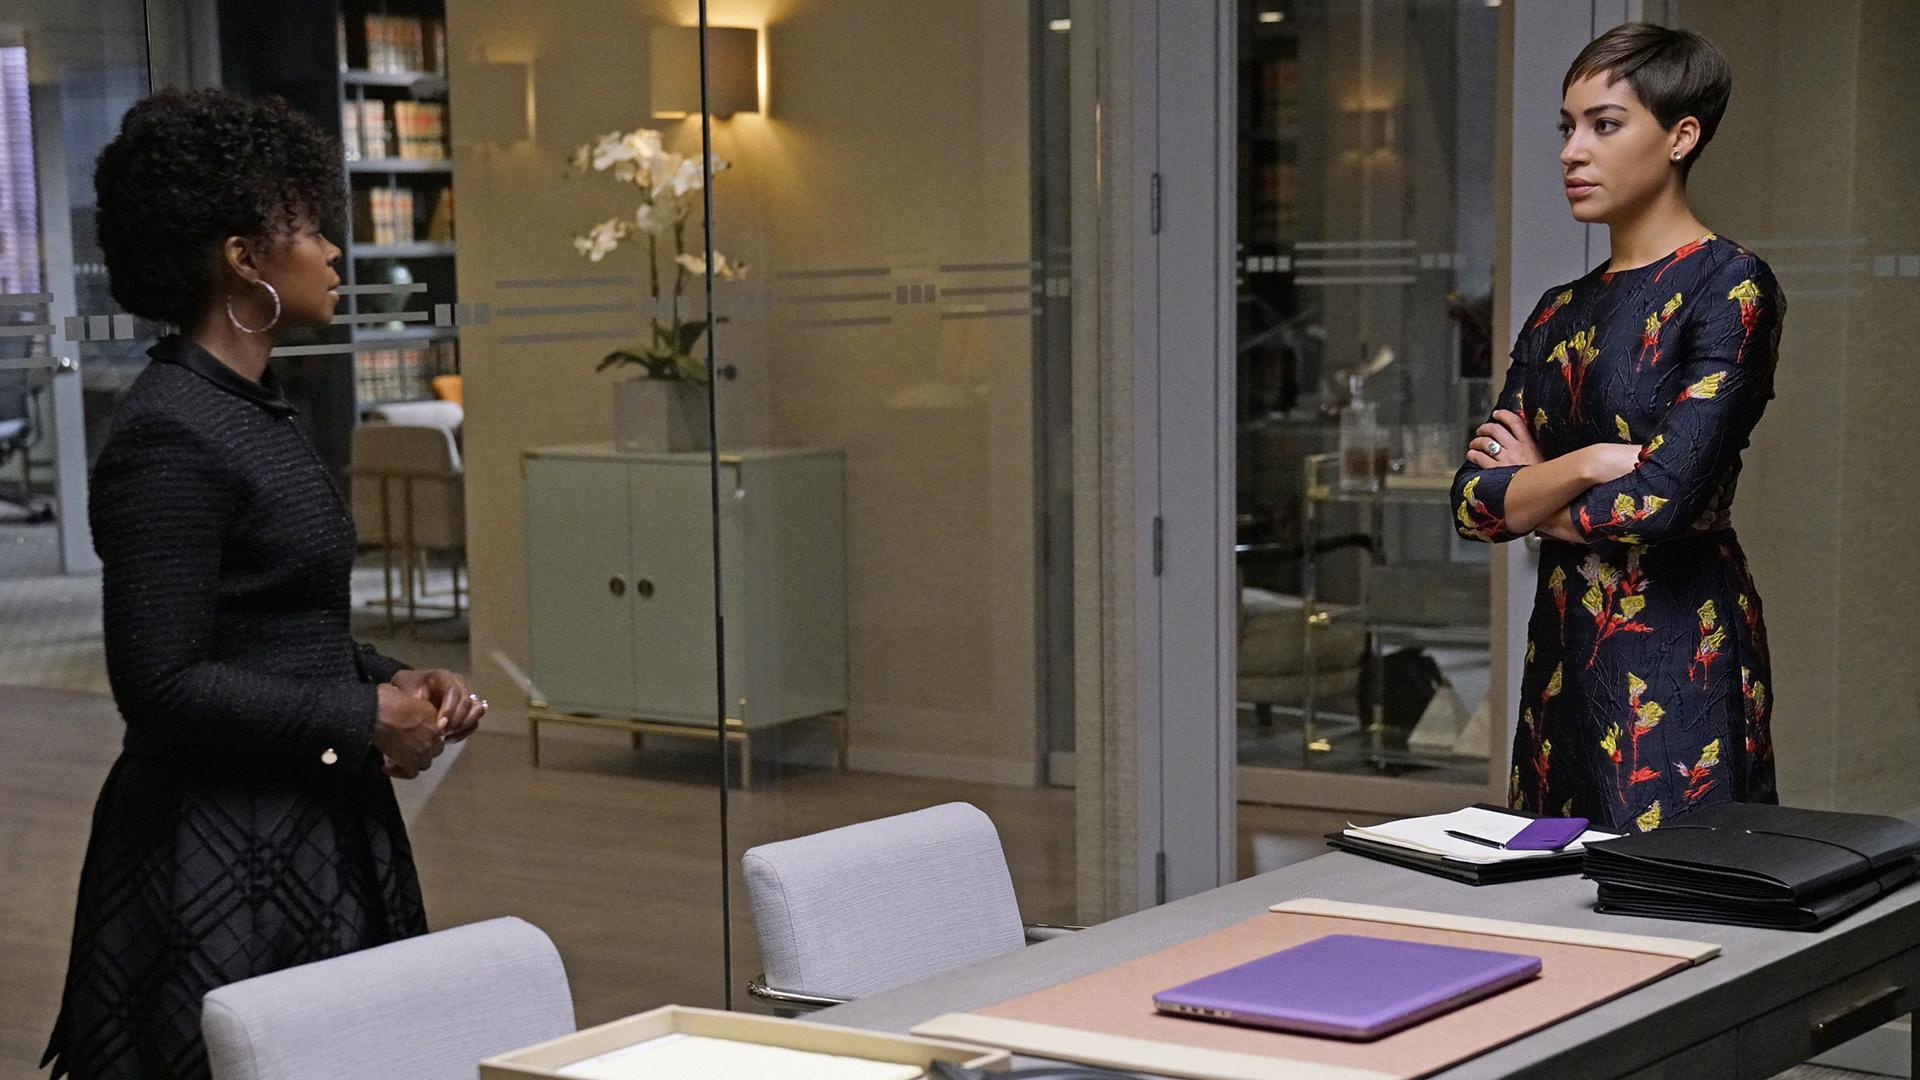 Lucca Quinn has a frank conversation with Barbara Kolstad.